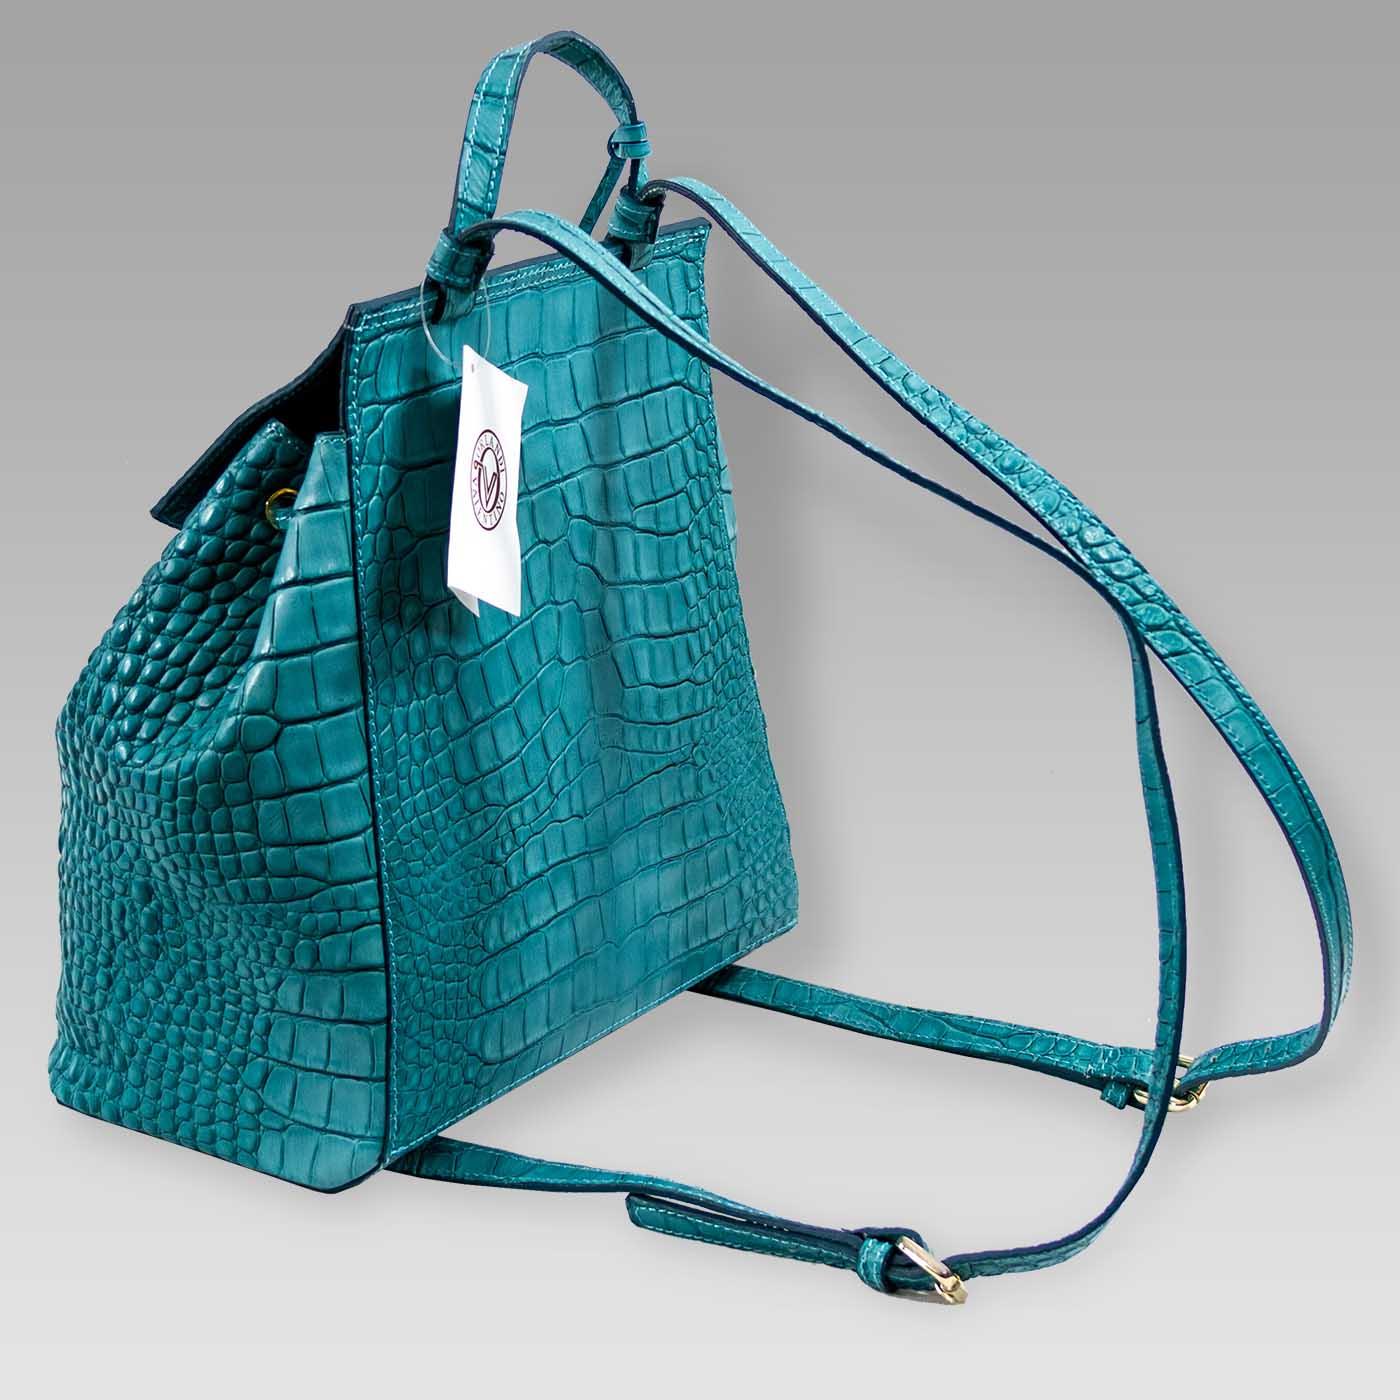 Valentino_Orlandi_Backpack_Deco_Blue_Croc_Embossed_Leather_Bucket_Bag_01VO41989CLAQ_01.jpg